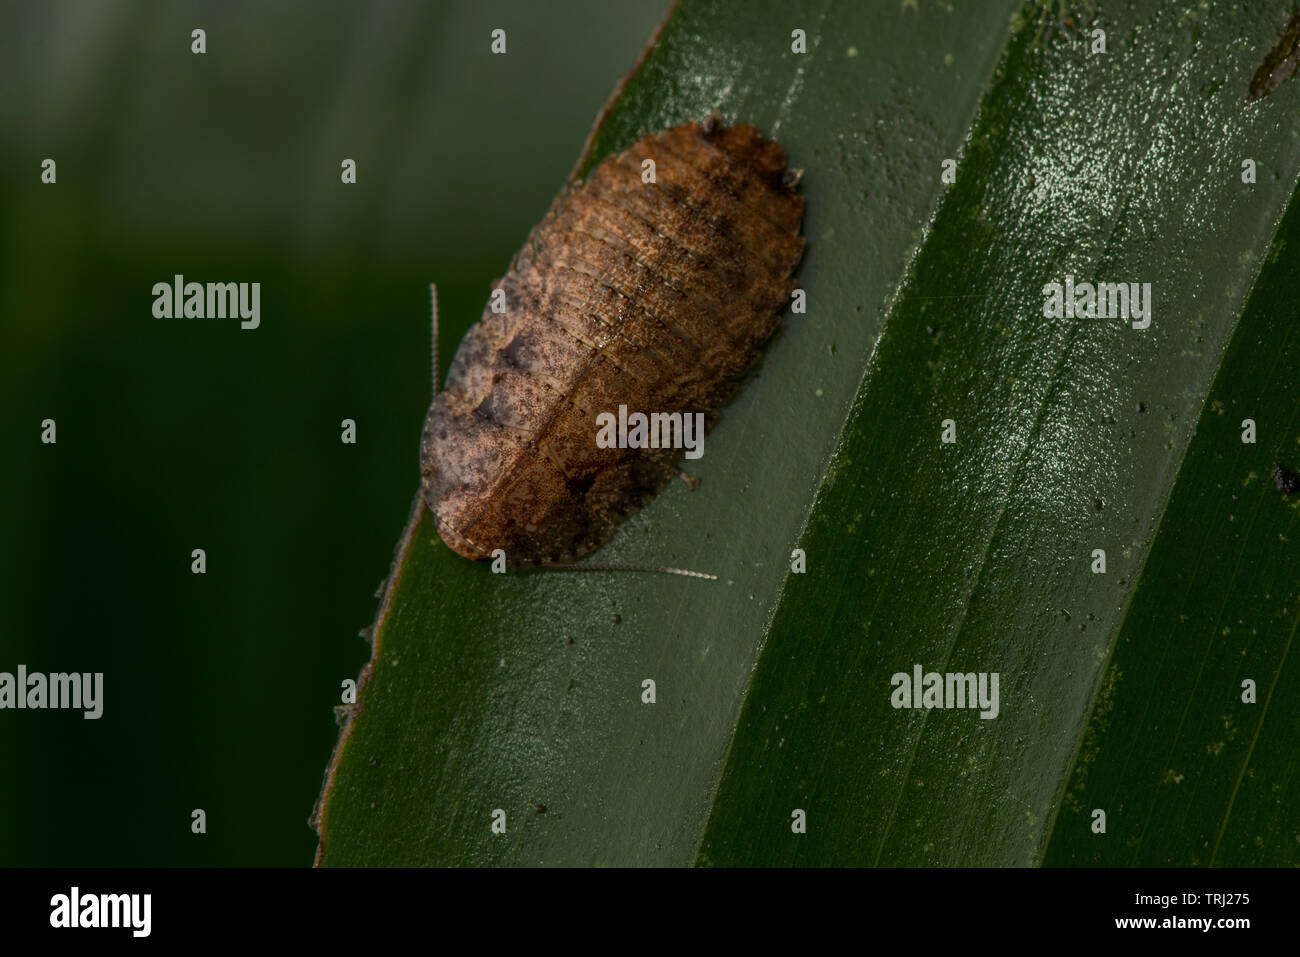 A cockroach in the Ecuadorian jungle in Orellana province. - Stock Image